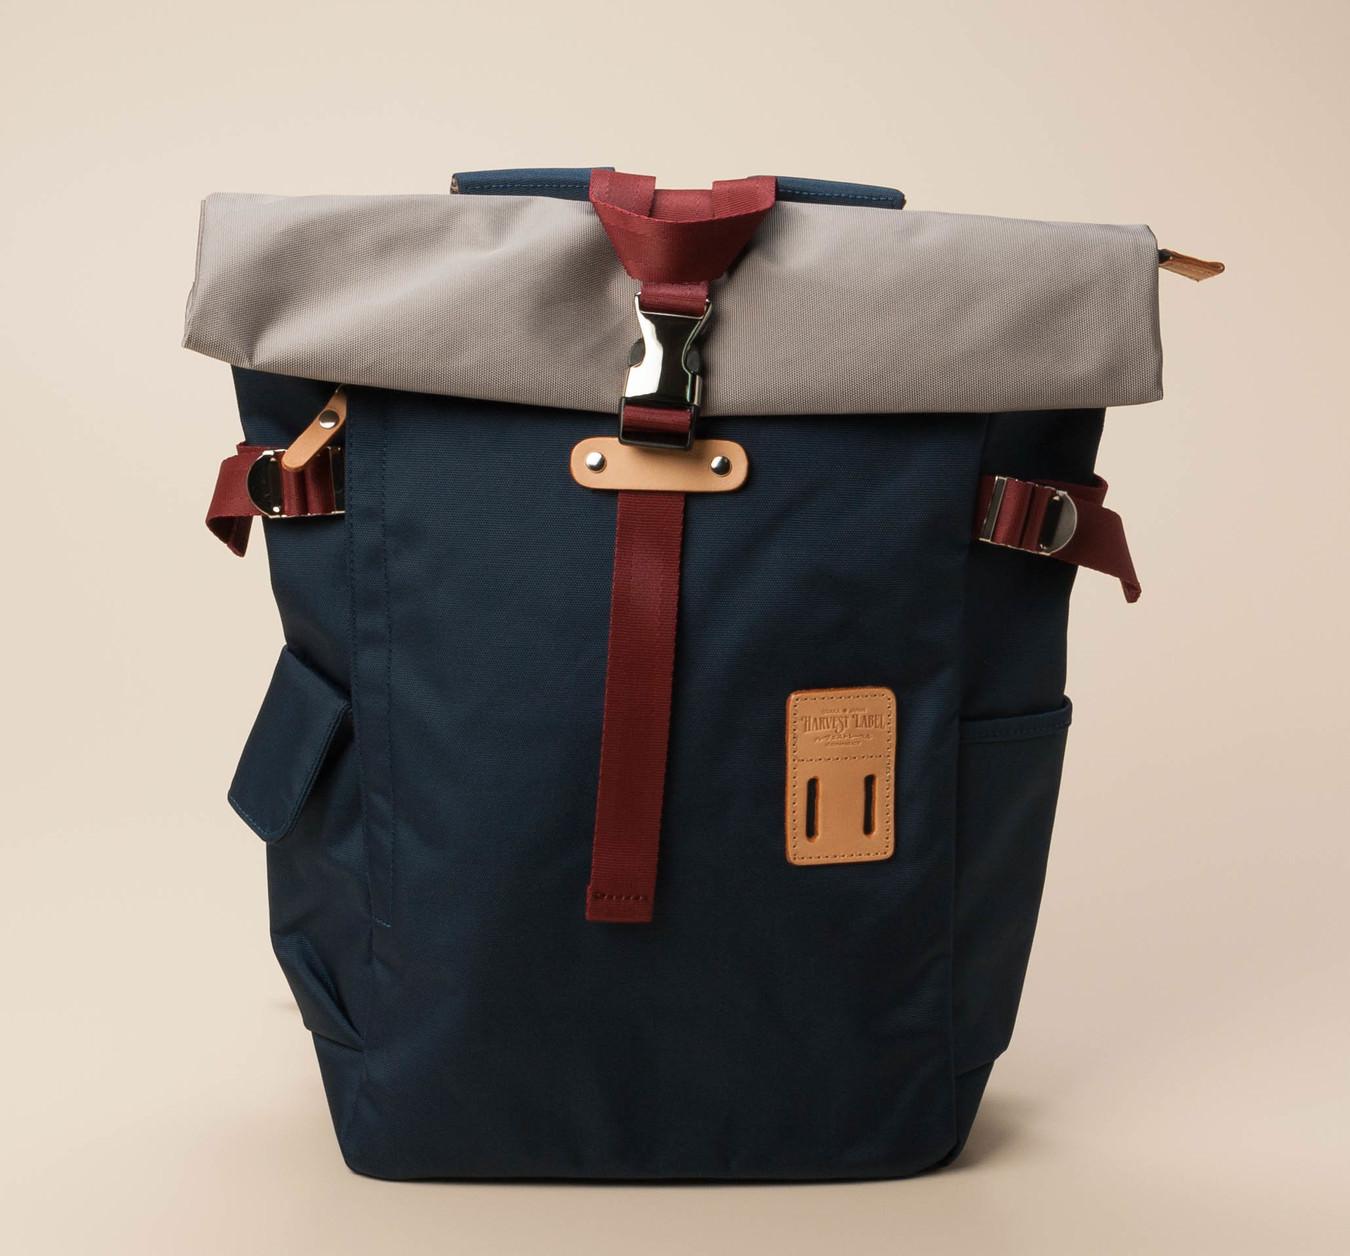 84ad551e113dc Harvest Label Damen-Acces. Rucksack in dunkelblau kaufen